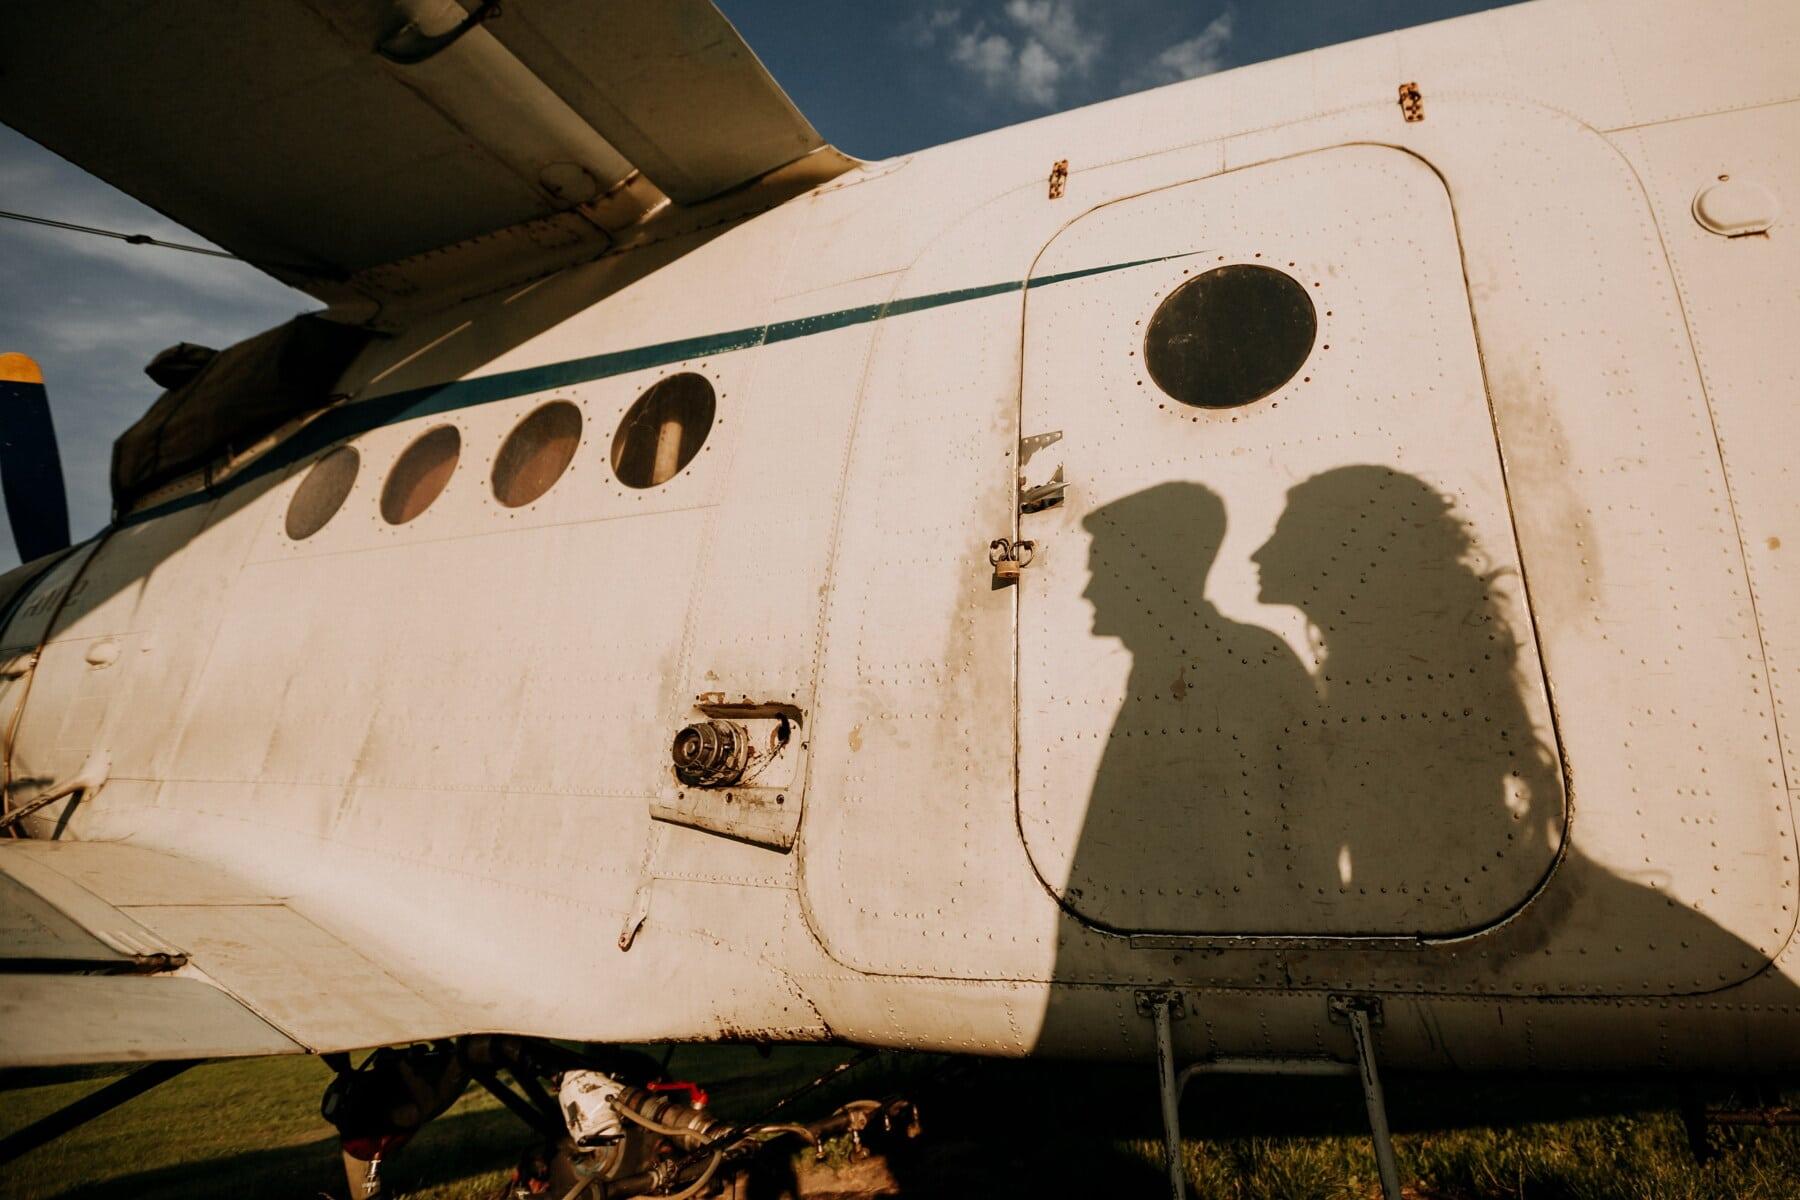 silhouette, boyfriend, girlfriend, airport, aircraft, propeller, aircraft engine, shadow, vehicle, airplane